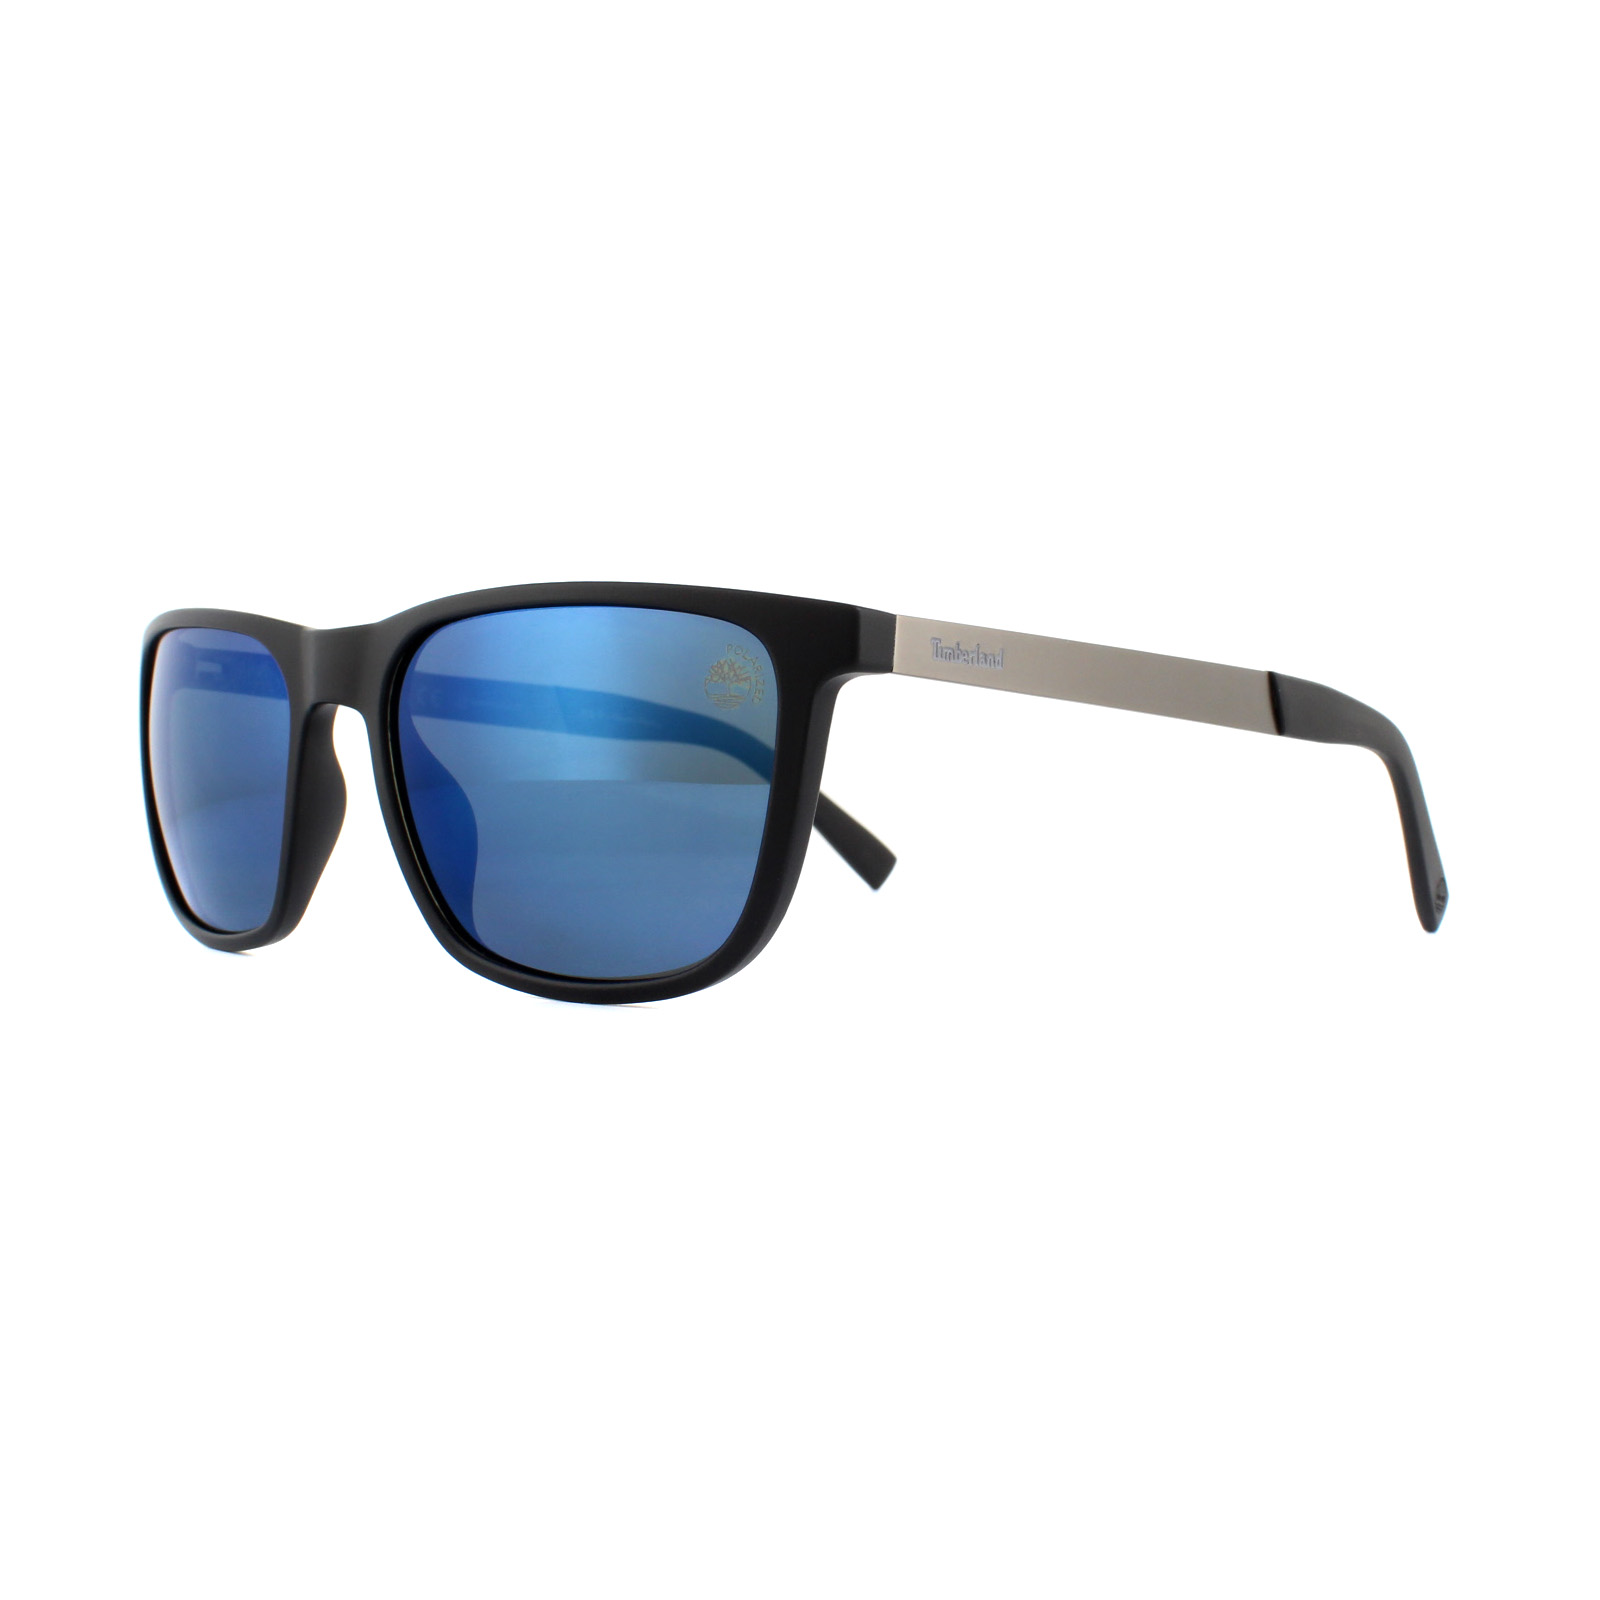 5d222a9d615 Sentinel Timberland Sunglasses TB9131 05D Black Blue Polarized